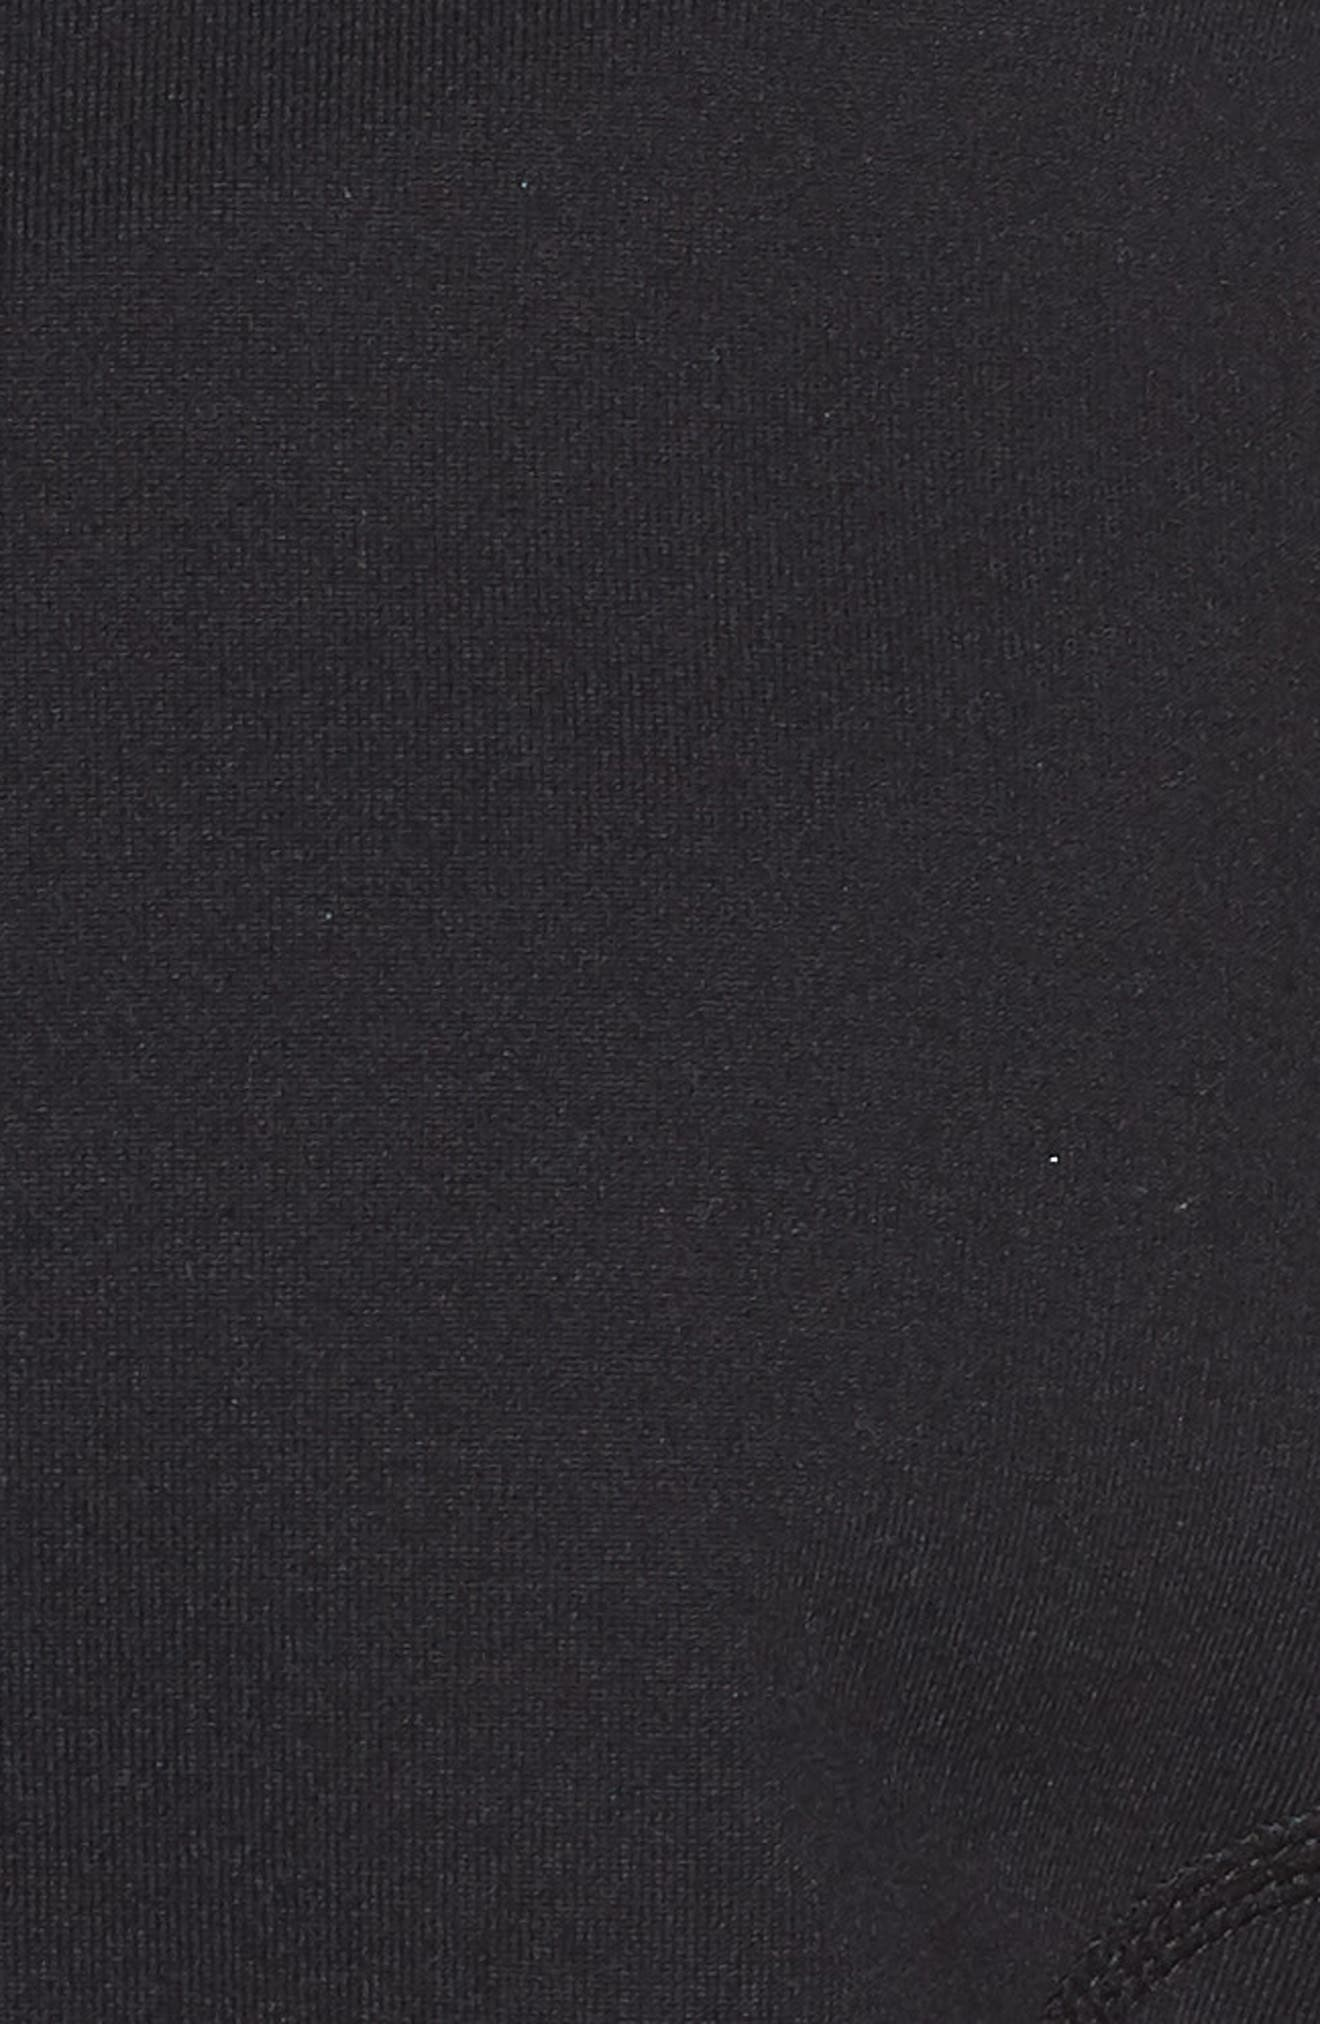 Transcend Jacket,                             Alternate thumbnail 6, color,                             BLACK